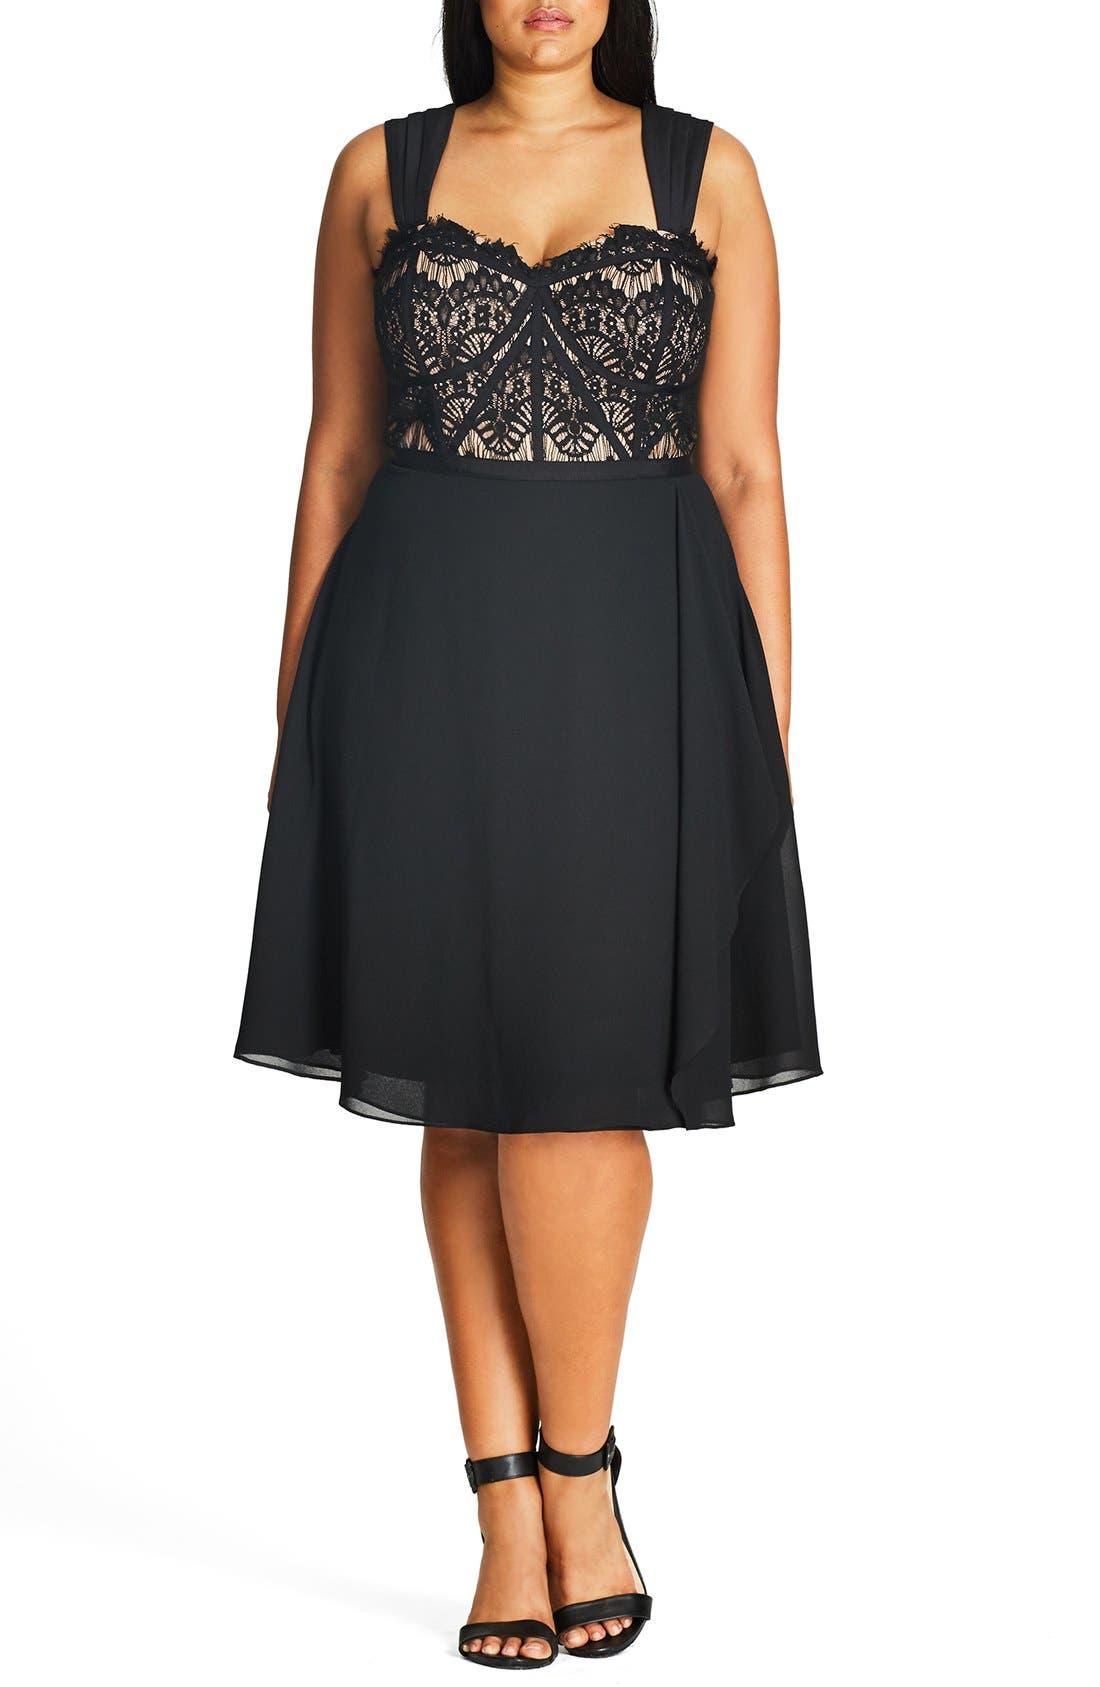 CITY CHIC Eyelash Evie Lace & Chiffon Cocktail Dress